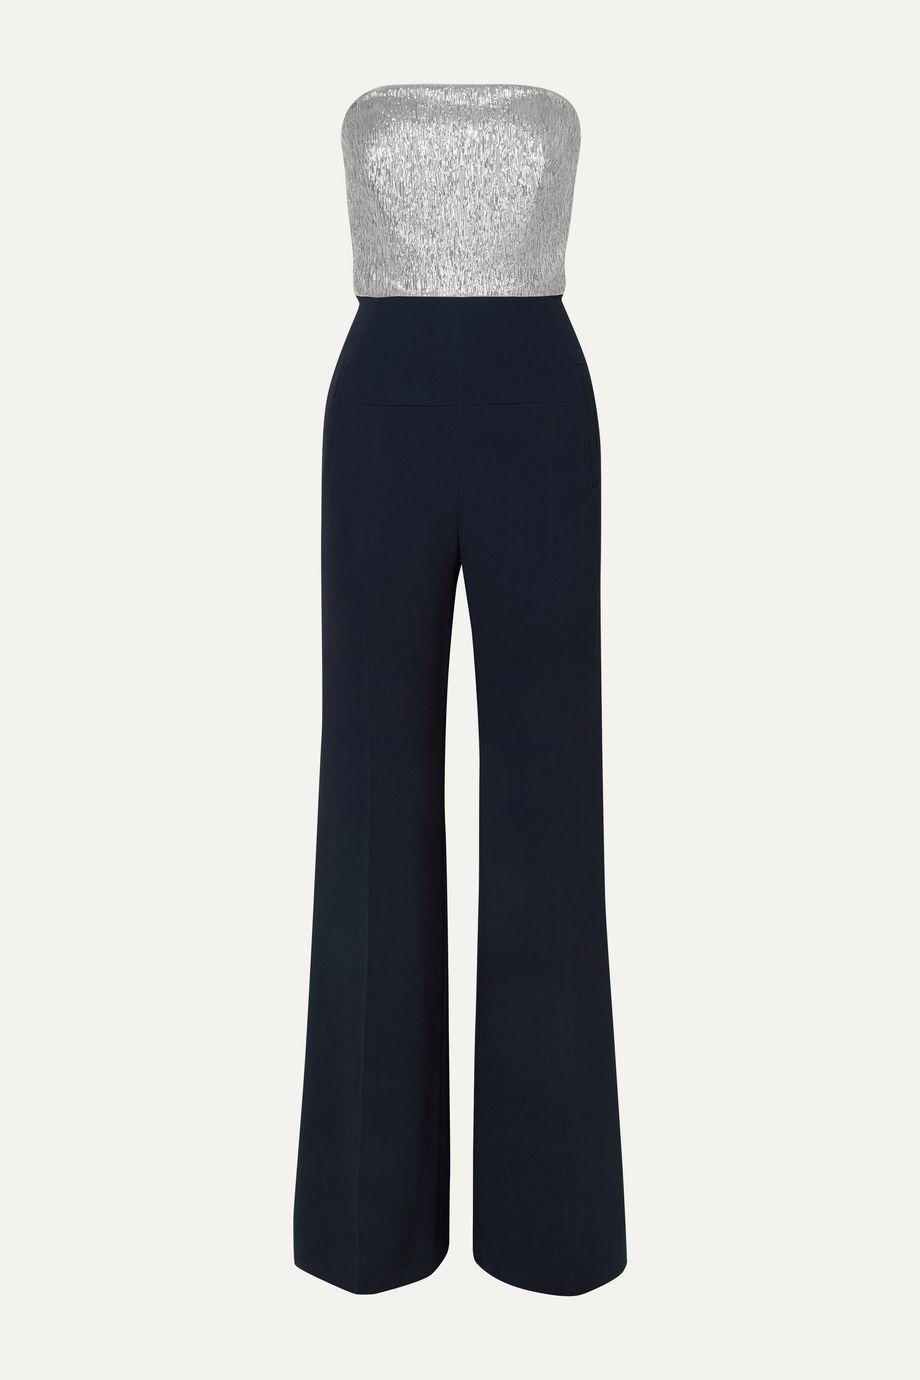 Roland Mouret Gifford strapless silk-blend Lurex and crepe jumpsuit